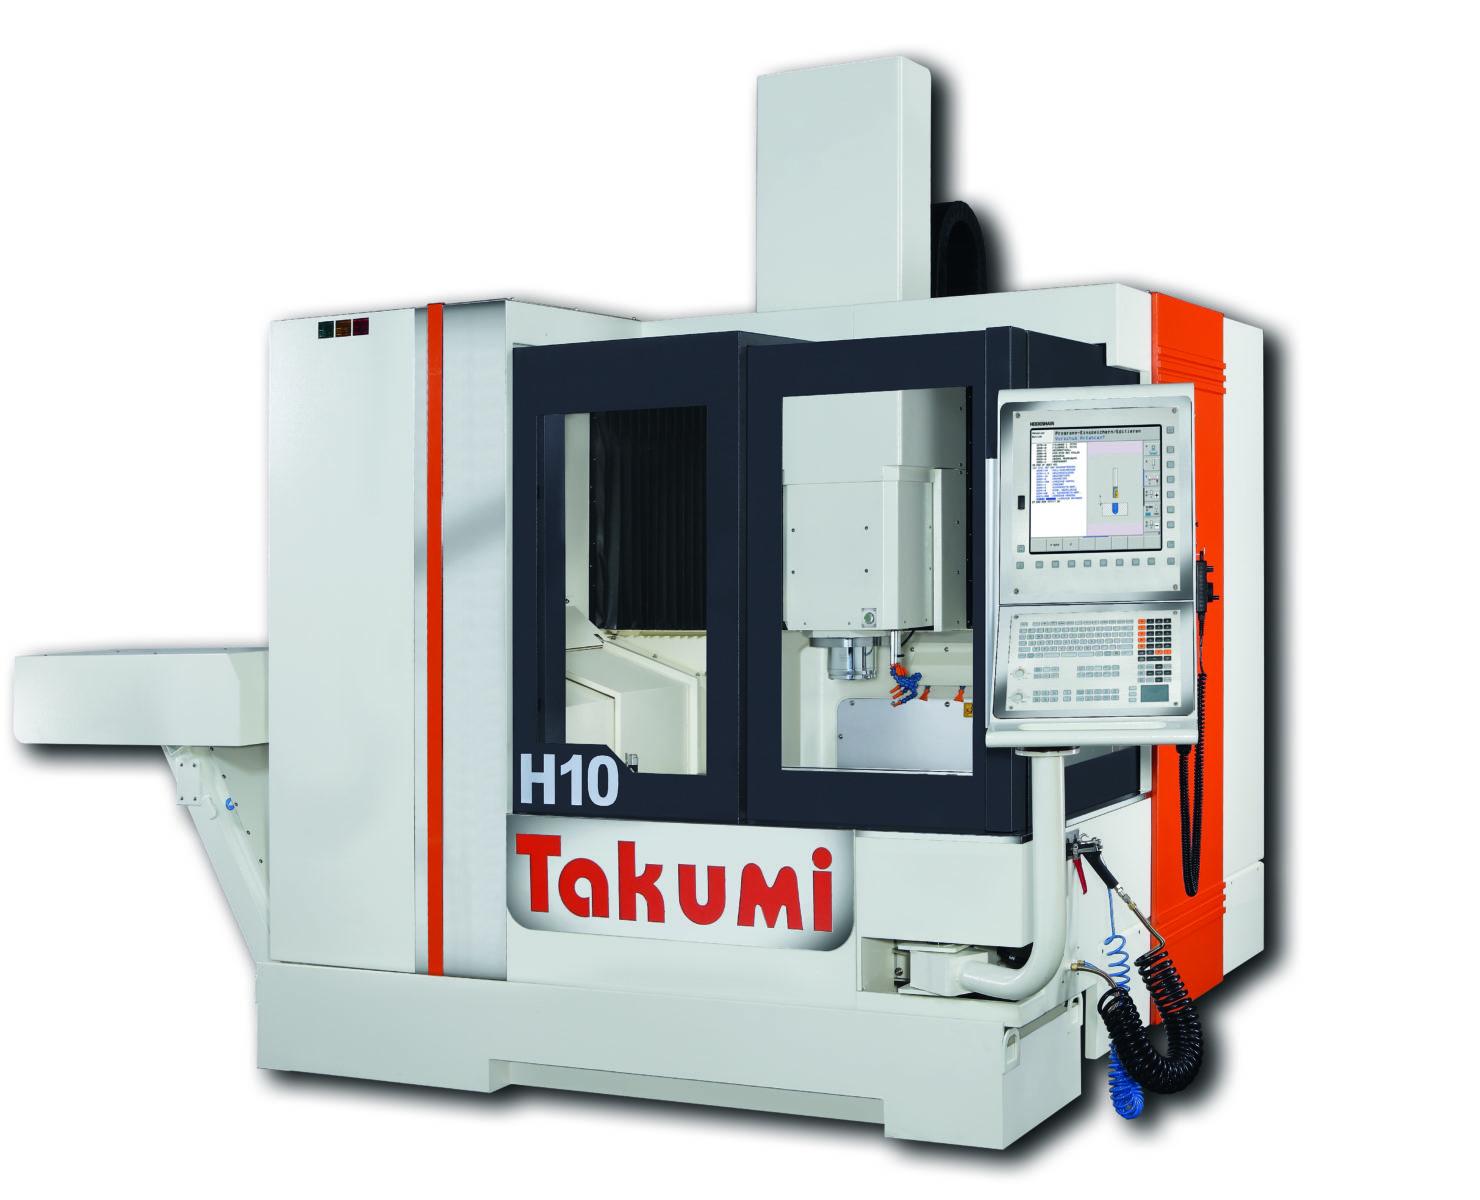 Takumi H10: 3-assig bewerkingscentrum met Heidenhain Control for Die & Mold